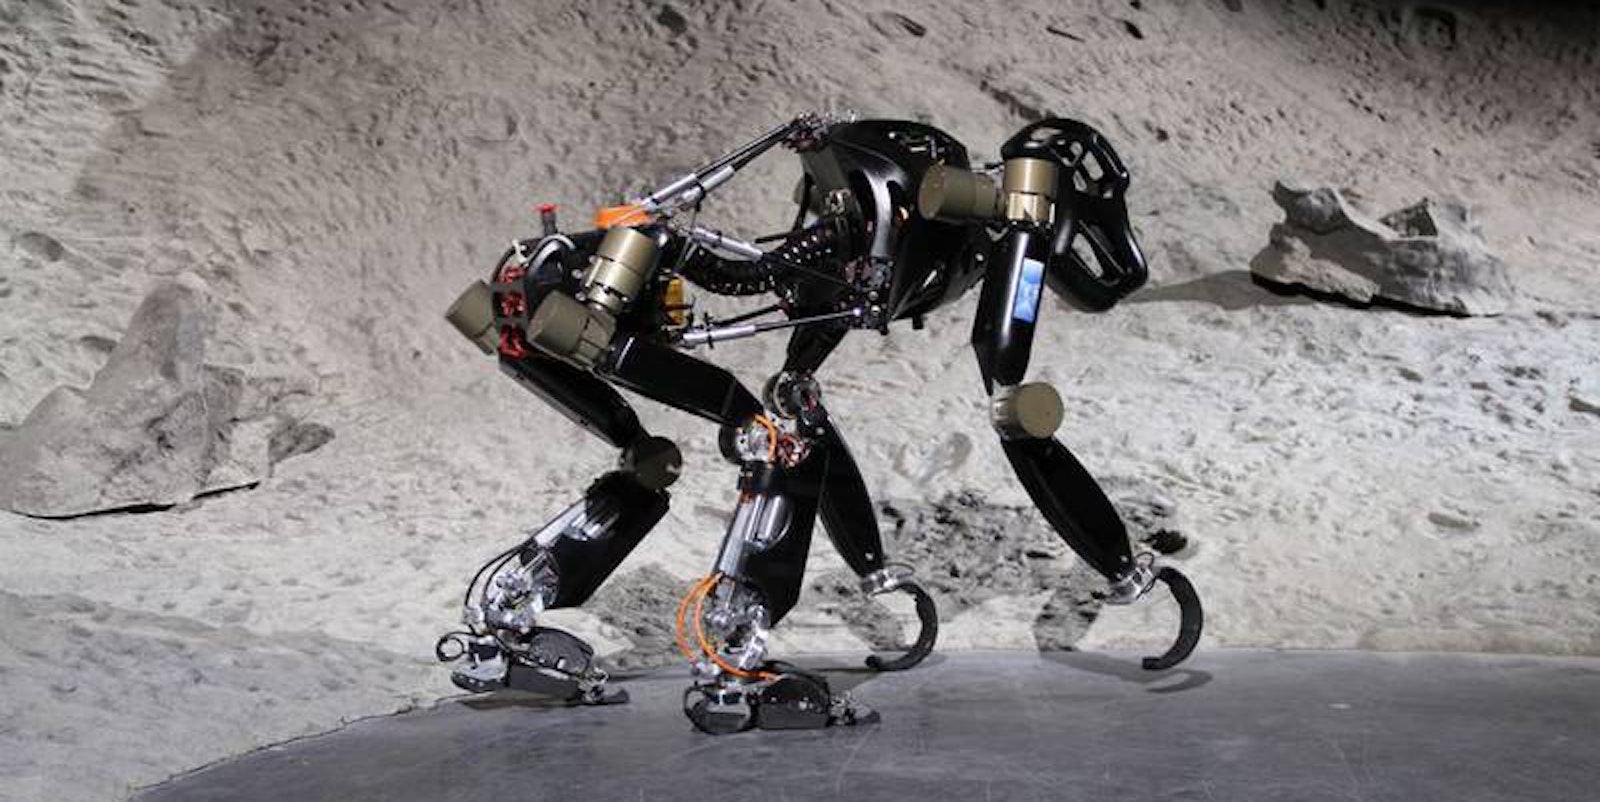 nasa robots on mars - photo #30